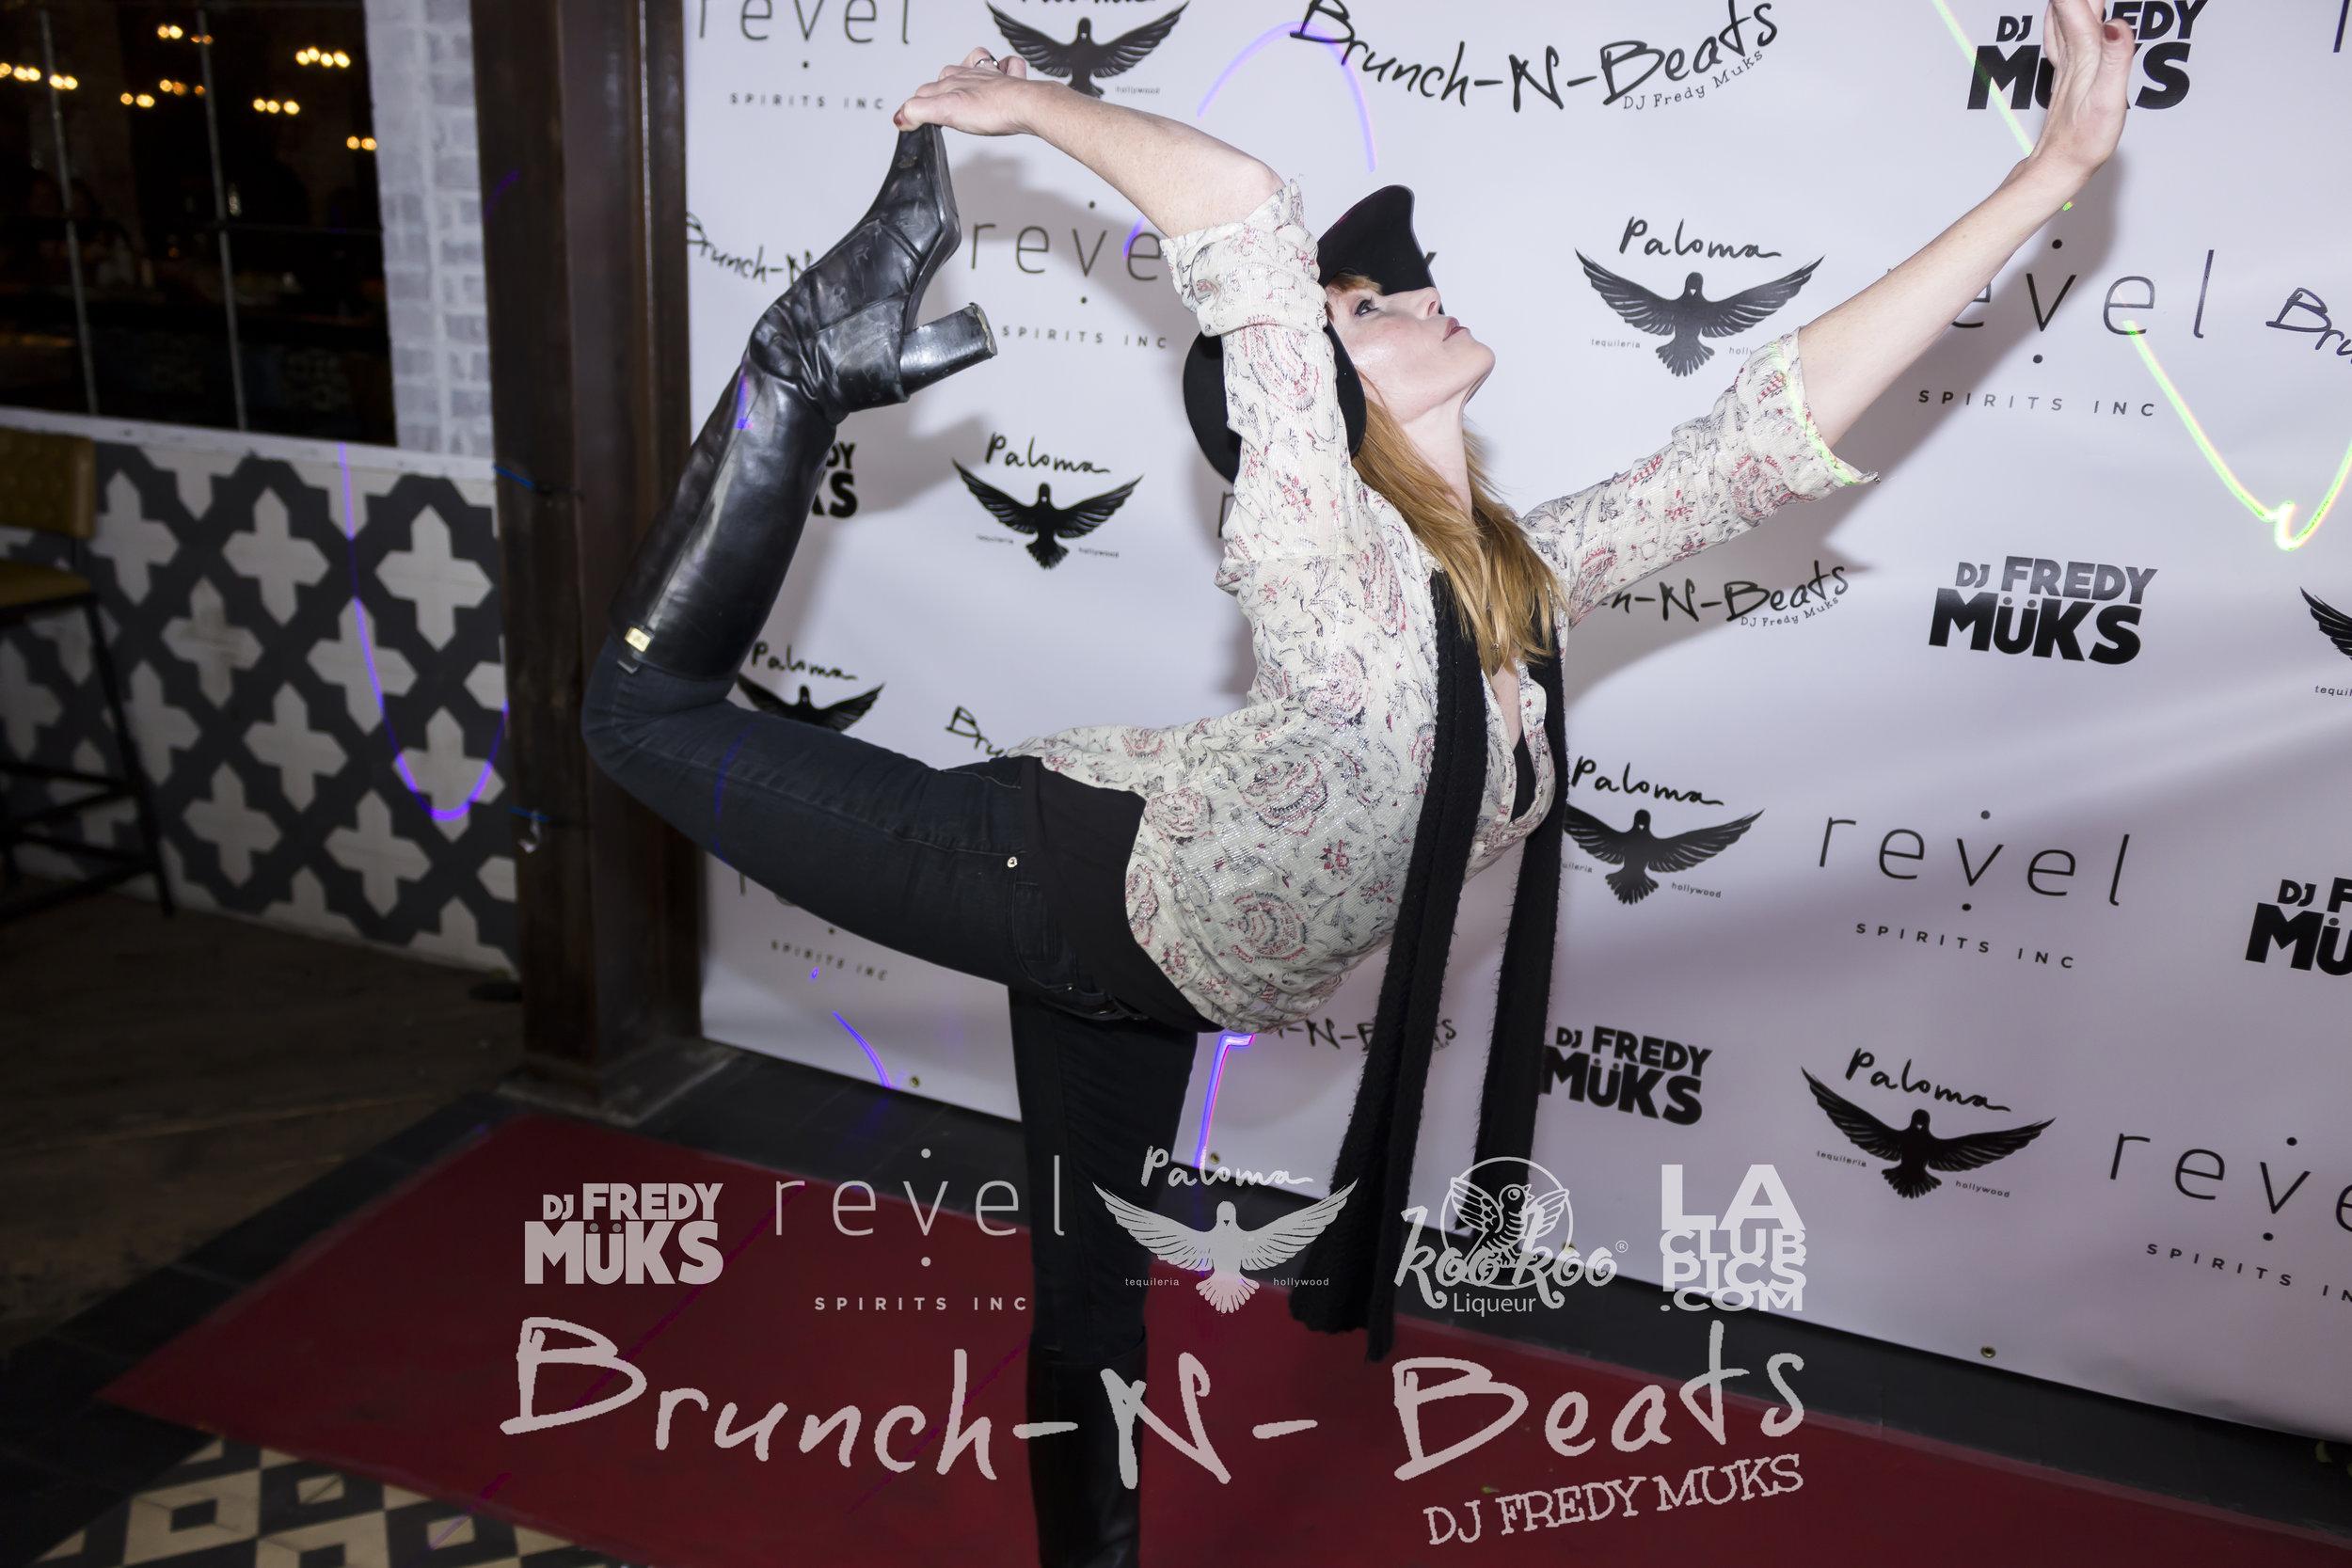 Brunch-N-Beats - Paloma Hollywood - 02-25-18_38.jpg